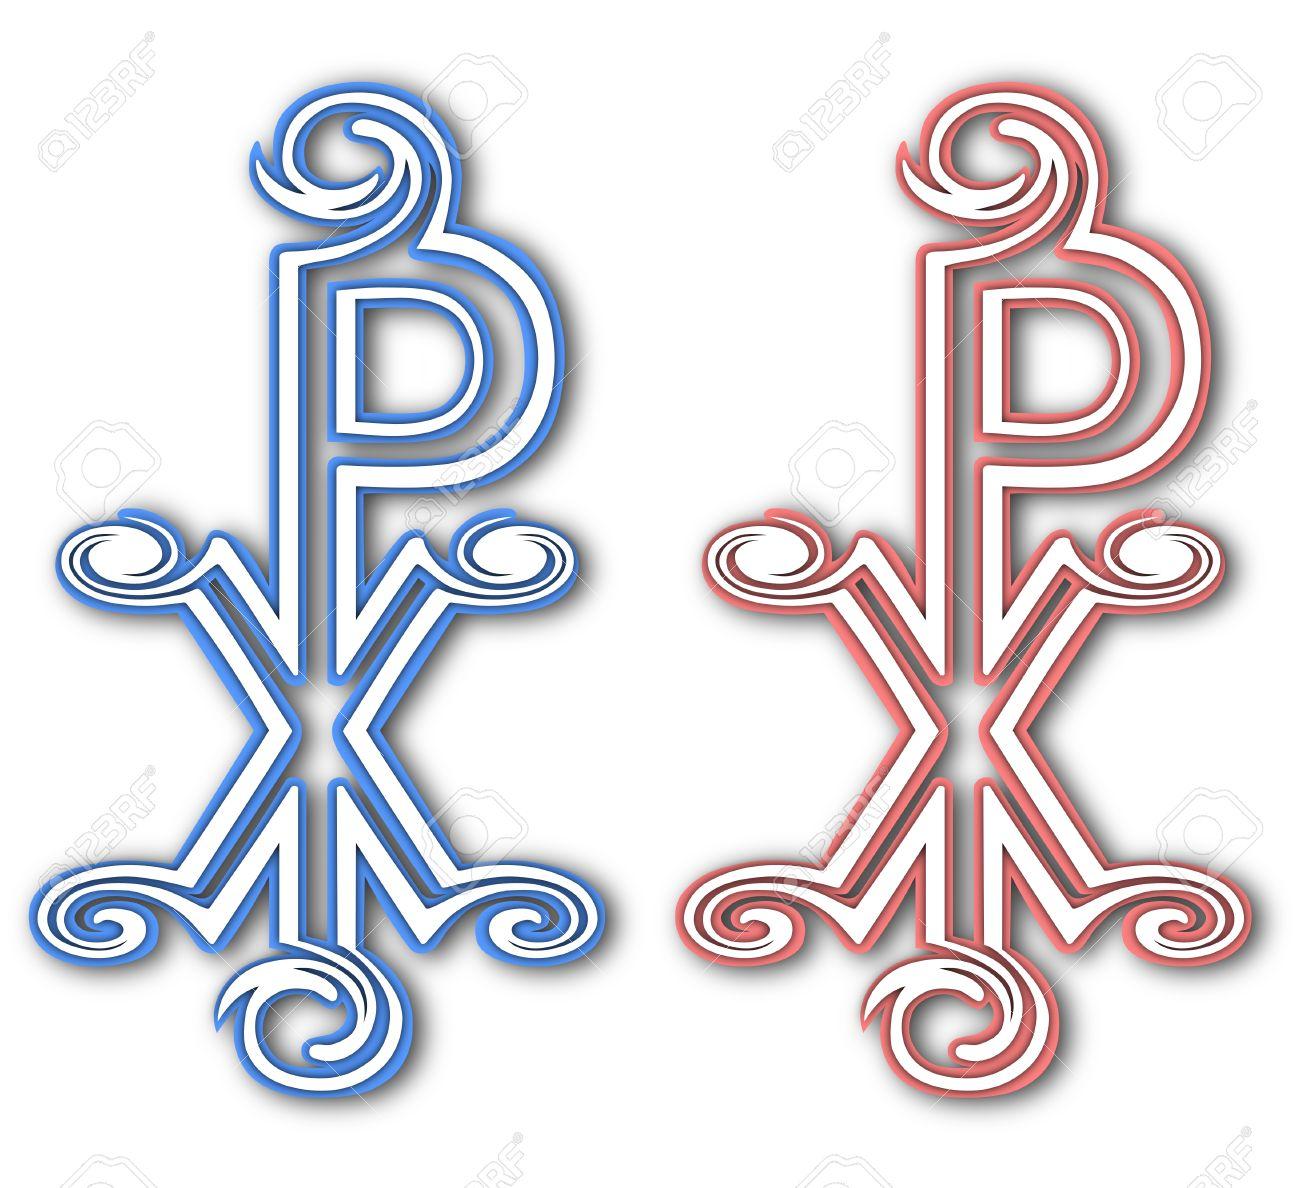 Christian chi rho symbol for christ labarum christogram christian chi rho symbol for christ labarum christogram isolated on white biocorpaavc Gallery